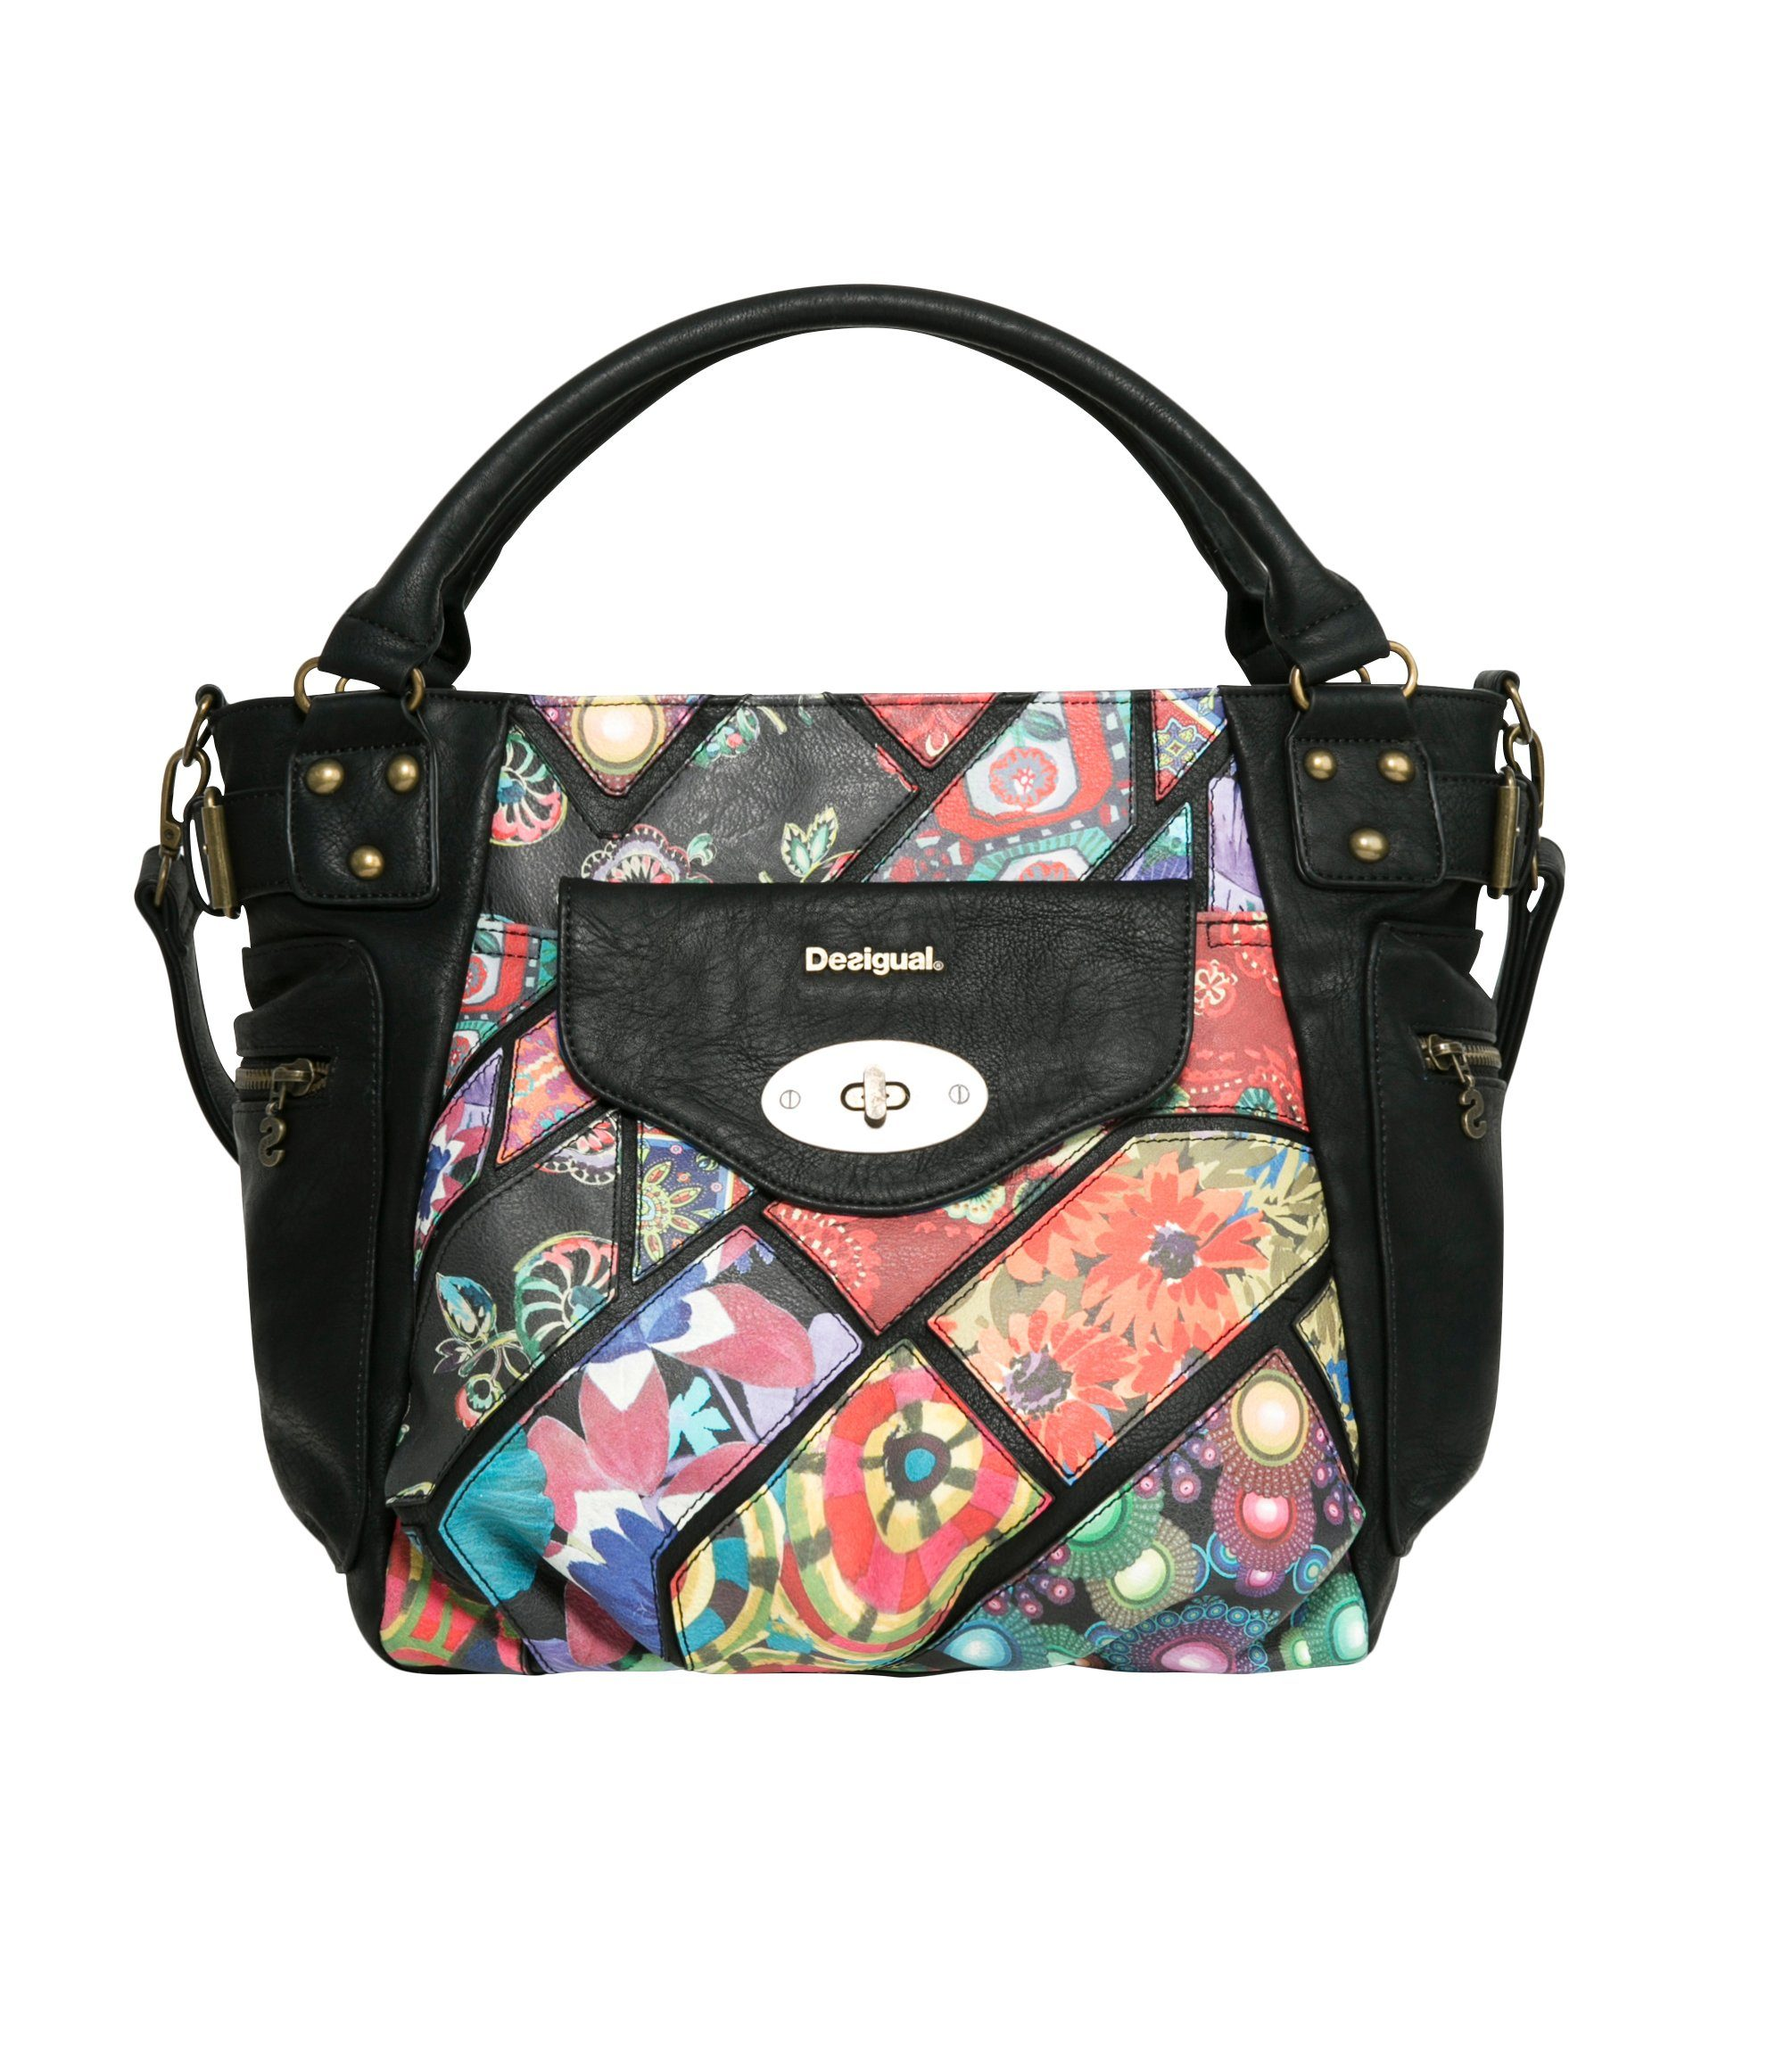 Desigual Handtasche »BOLS MCBEE INDIANA«